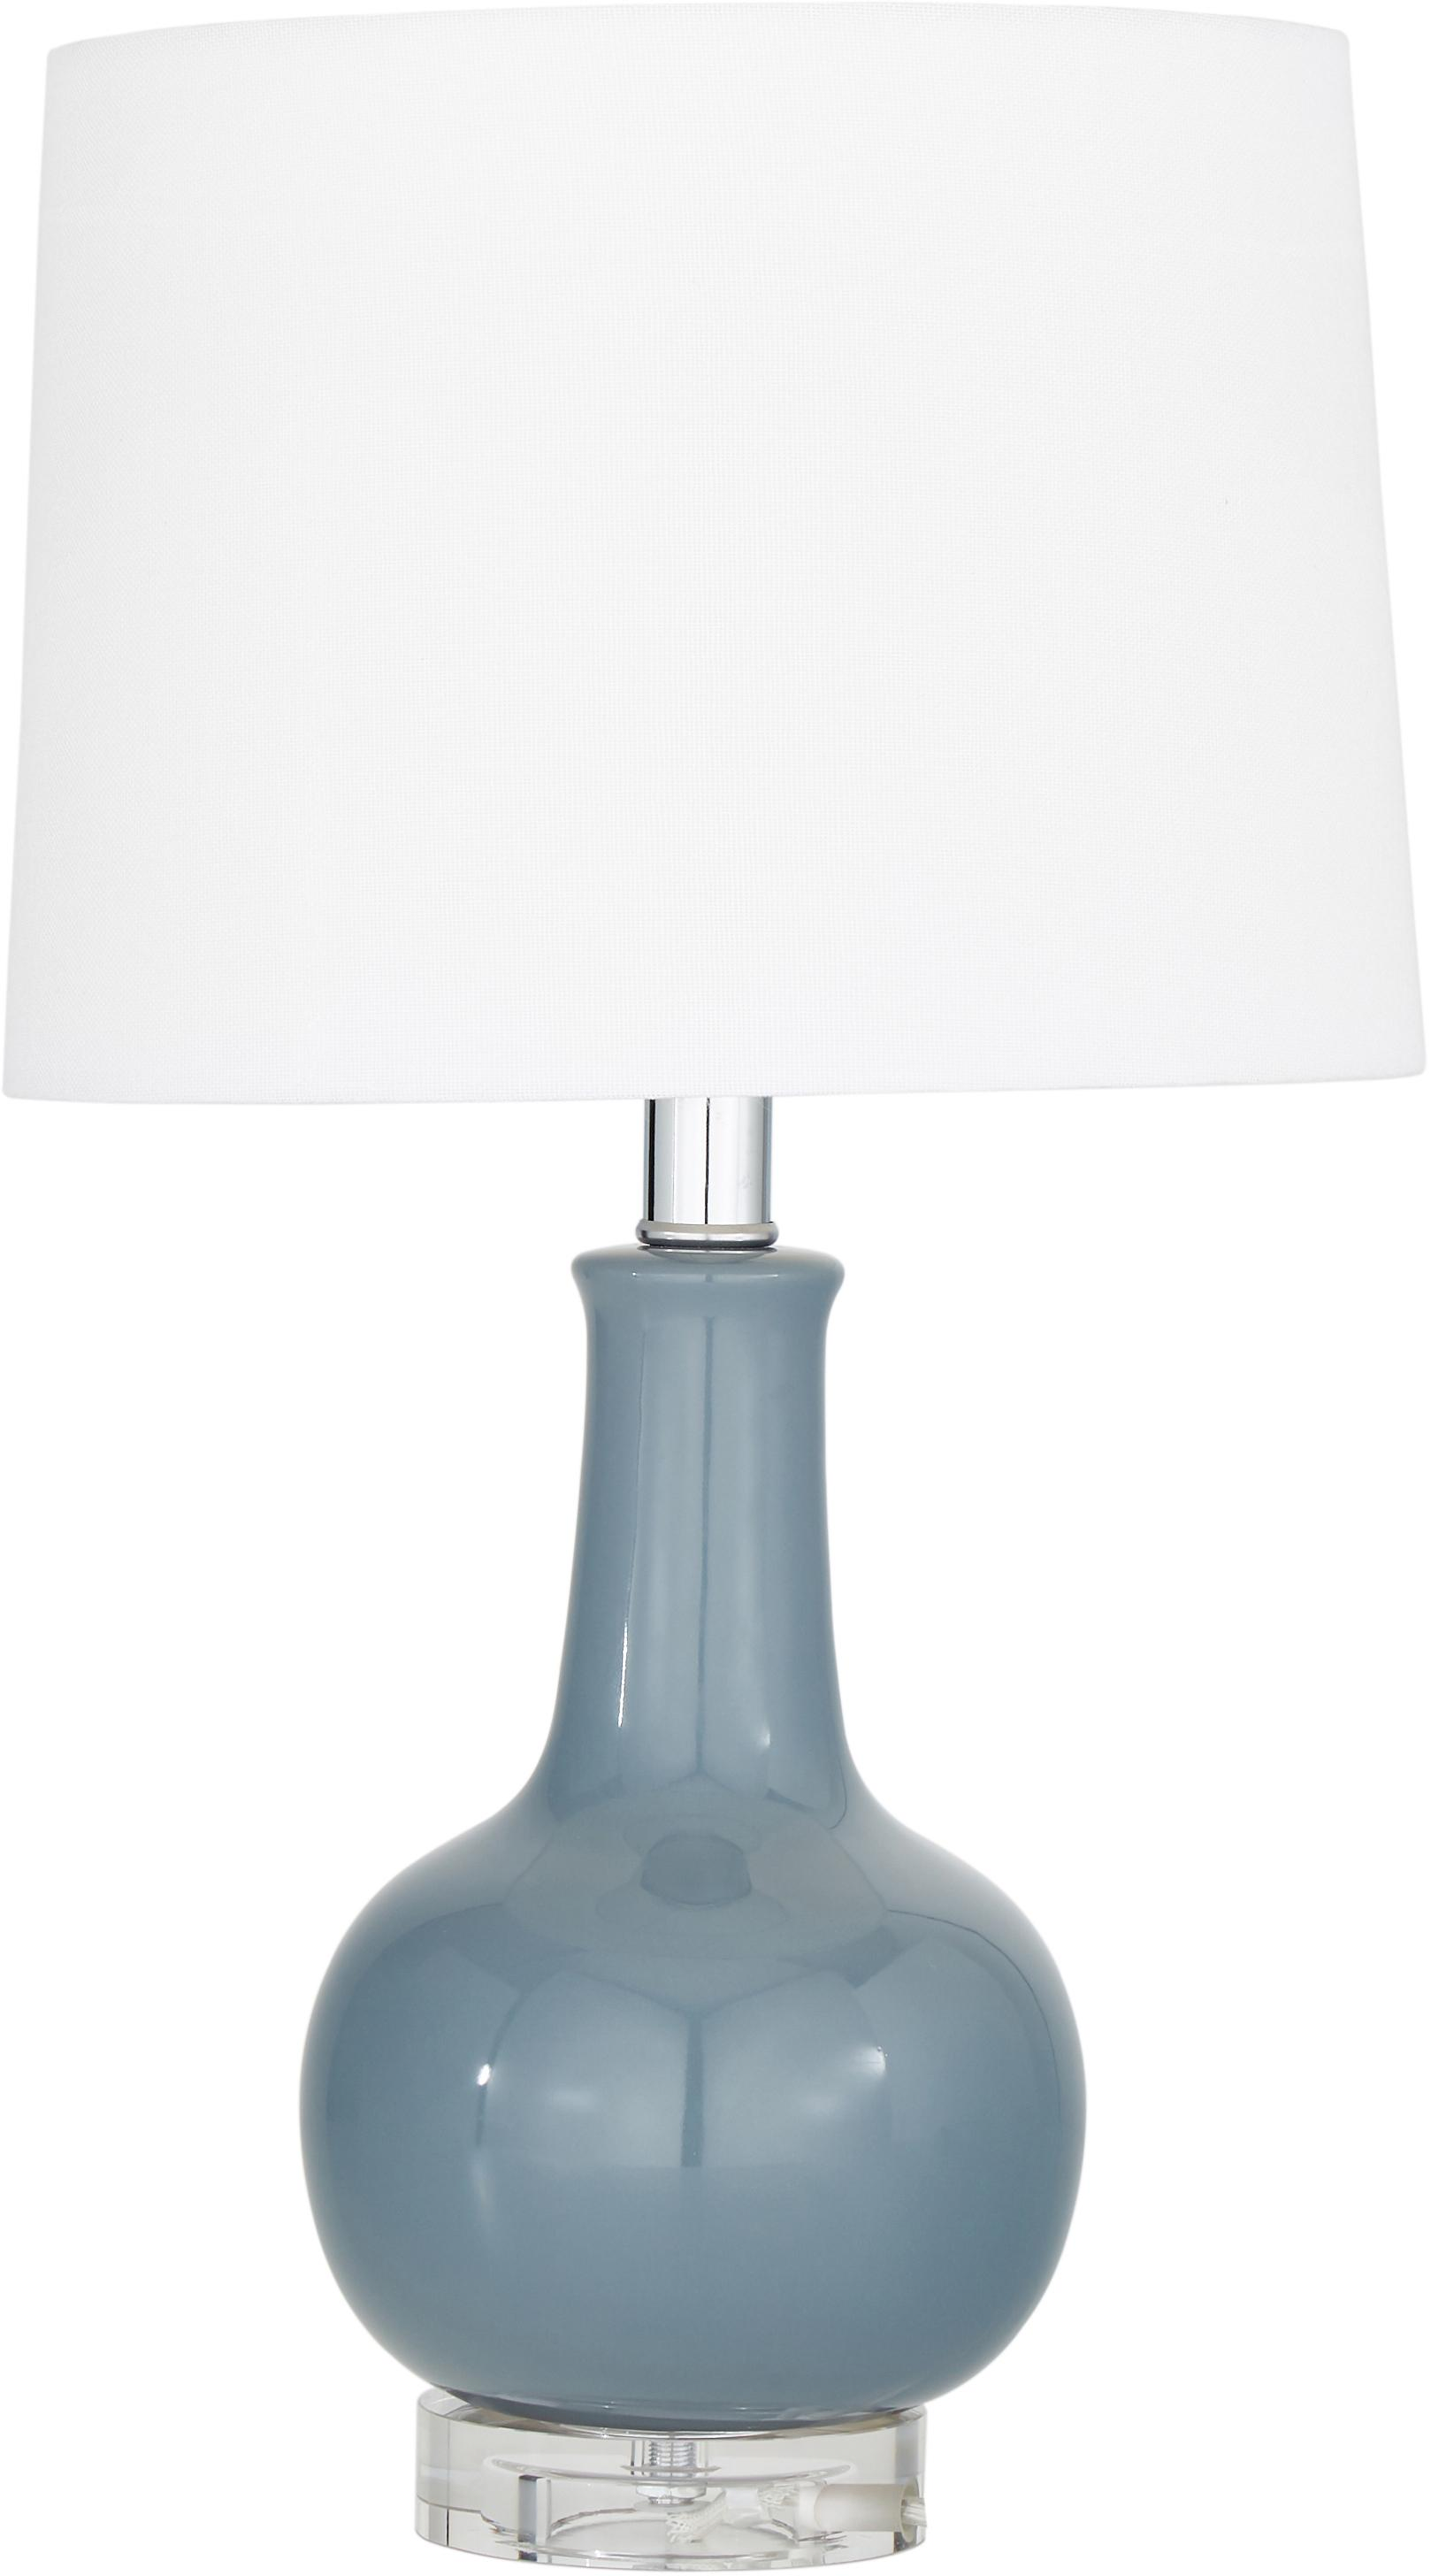 Keramische tafellamp Brittany, Lampenkap: textiel, Lampvoet: keramiek, kristalglas, Wit, grijs, Ø 28 x H 48 cm